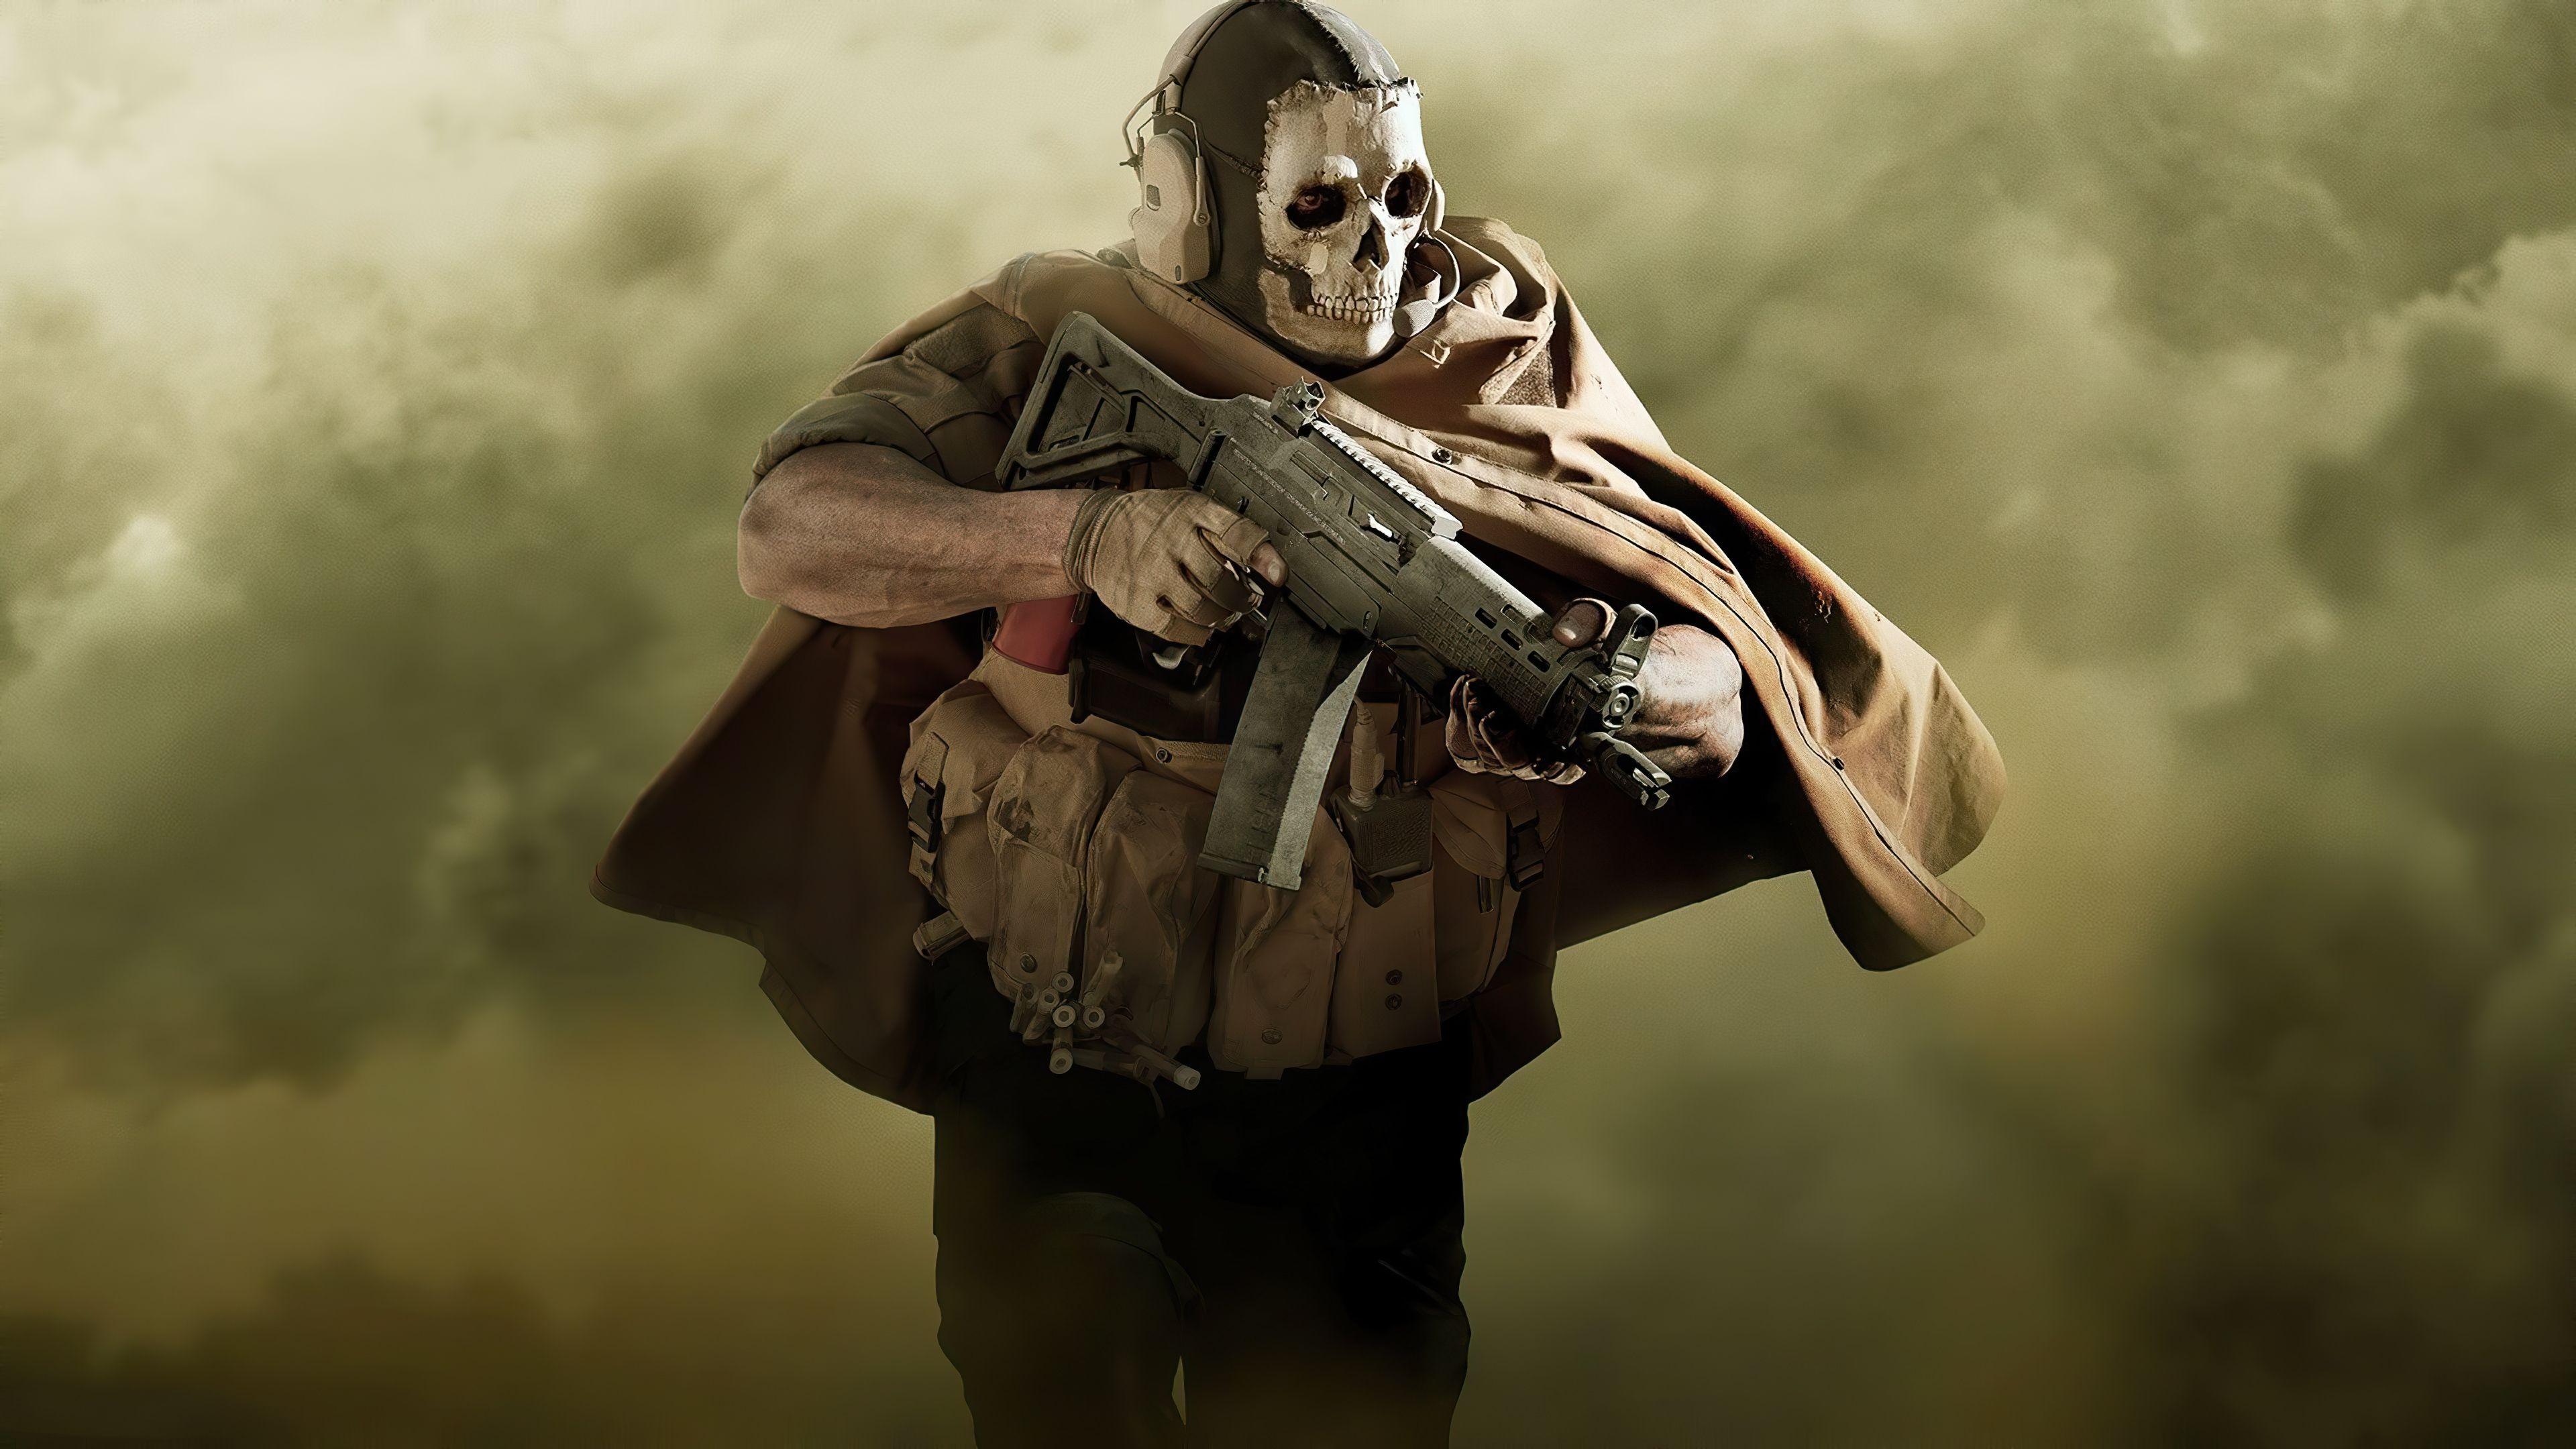 Https Images4 Alphacoders Com 109 1091589 Jpg Call Of Duty Modern Warfare Xbox One